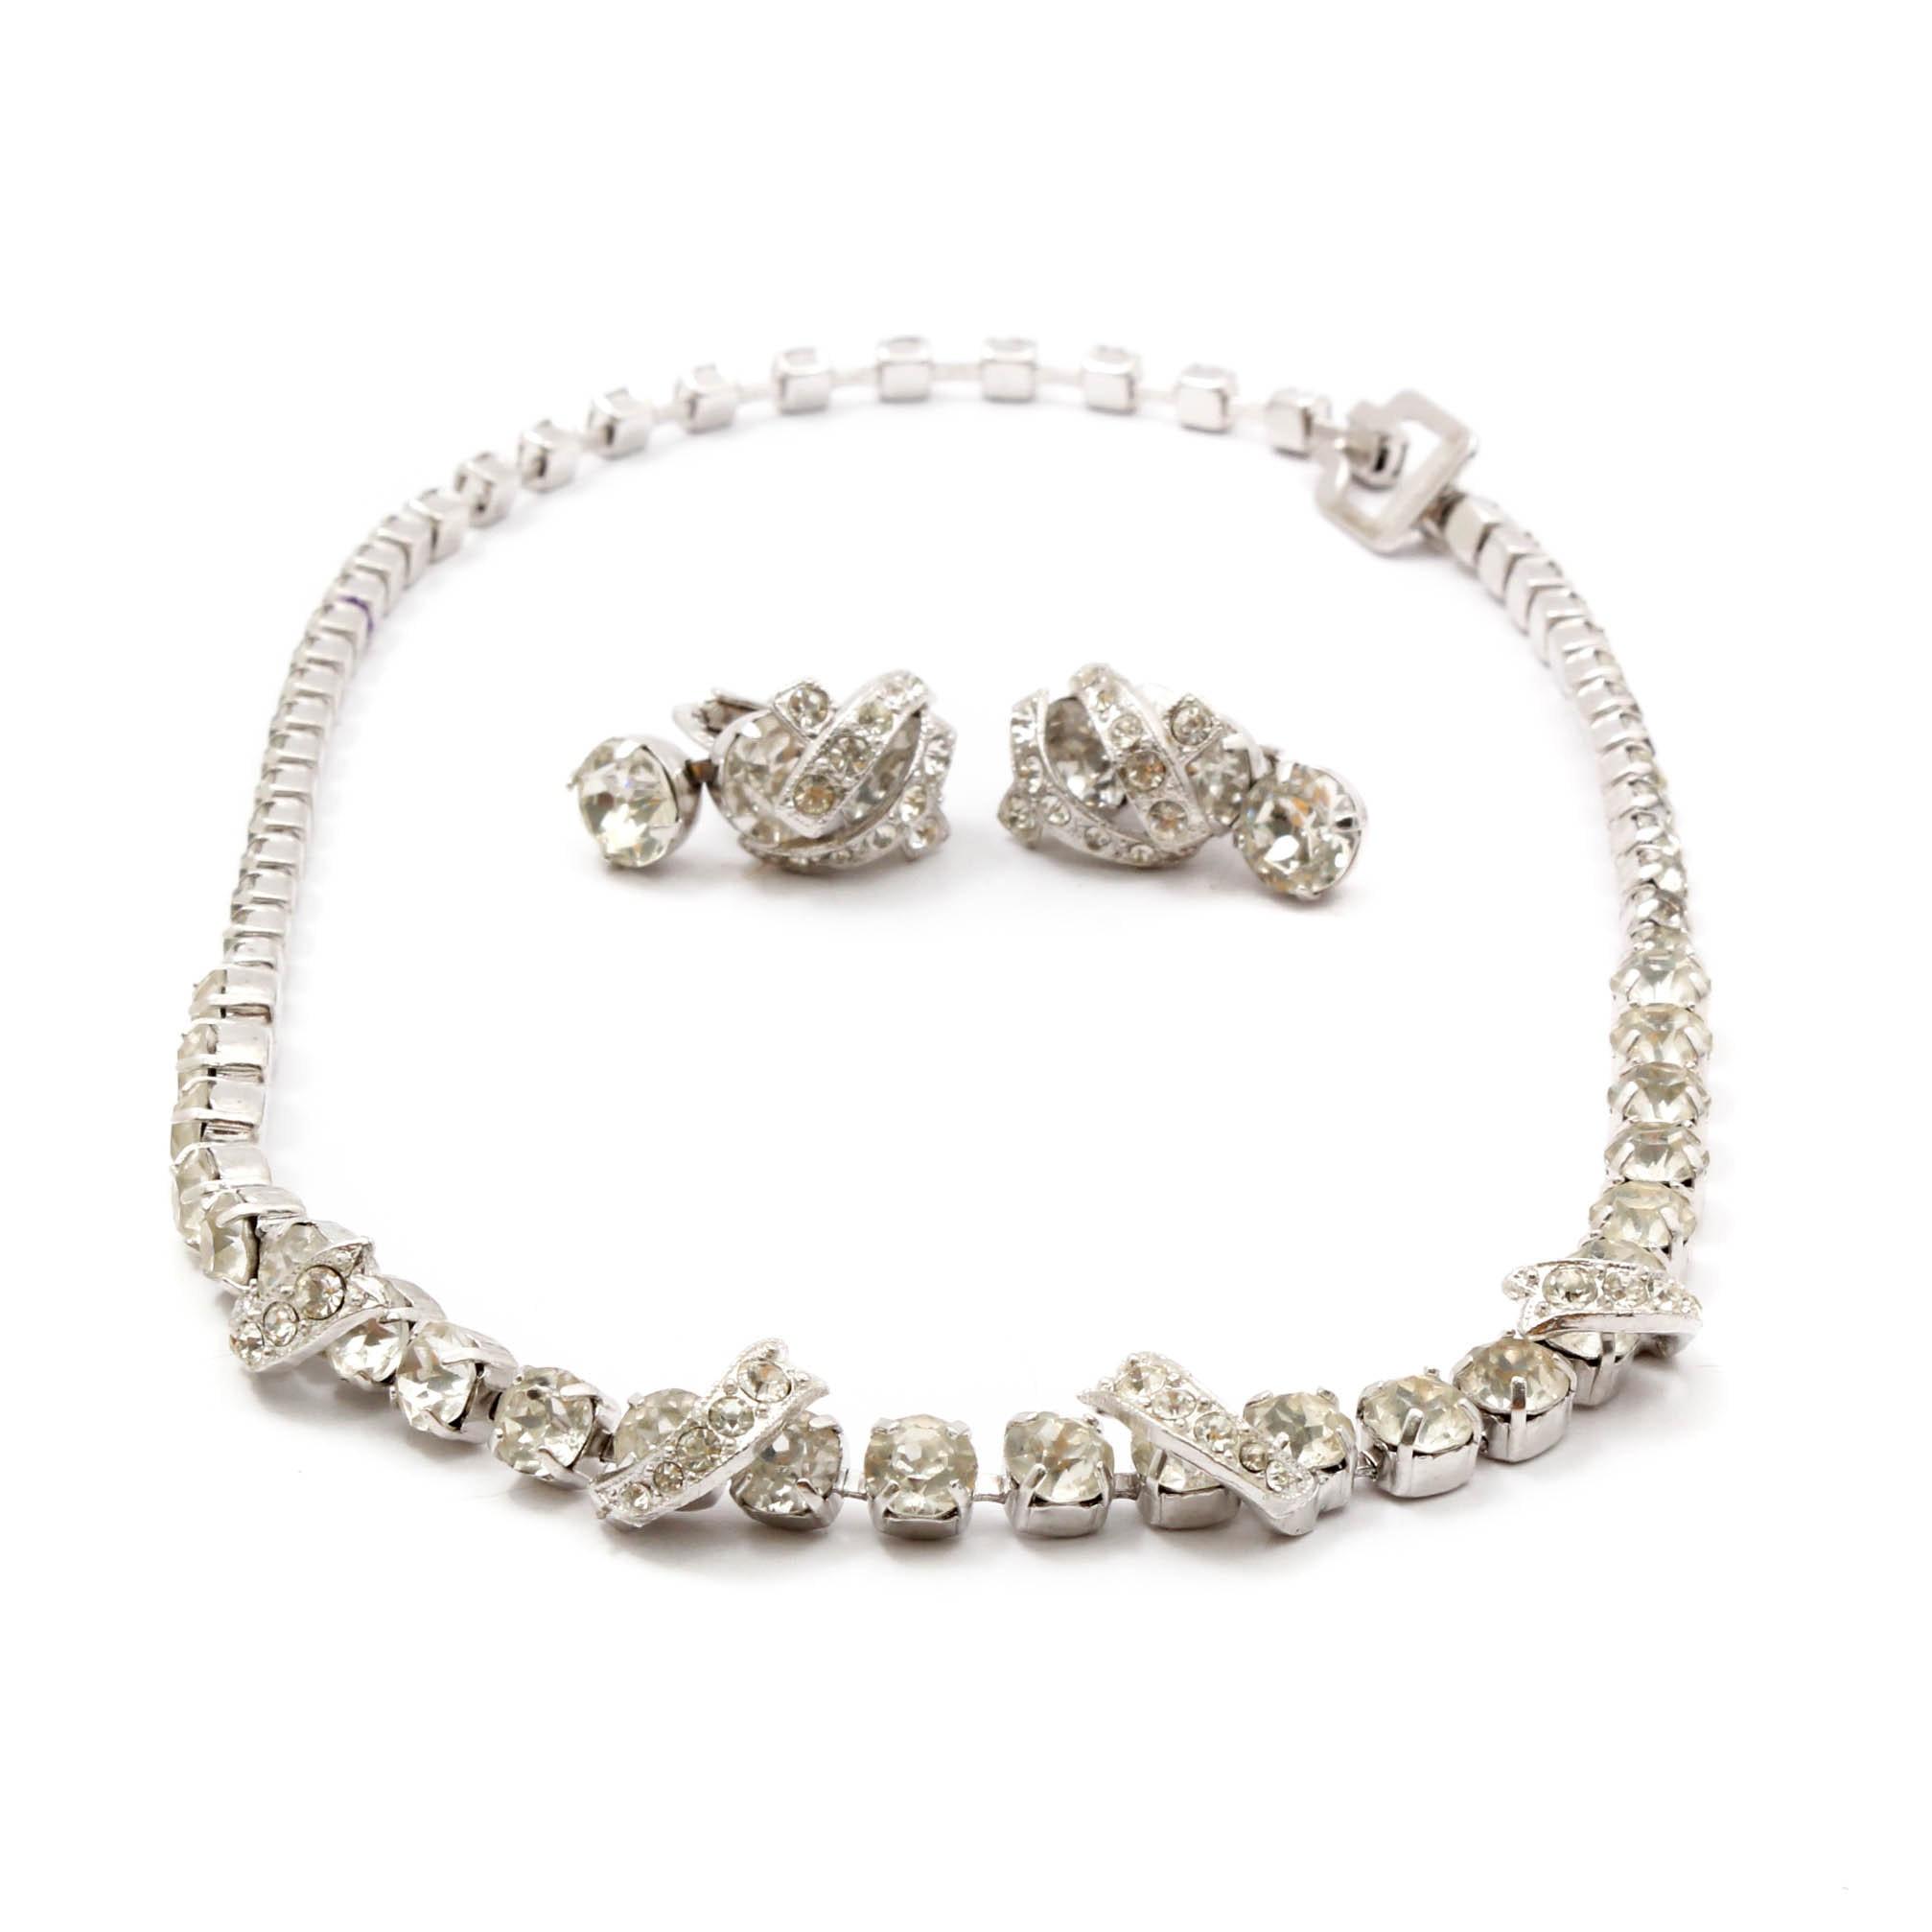 Vintage Eisenberg Ice Rhinestone Necklace and Earrings